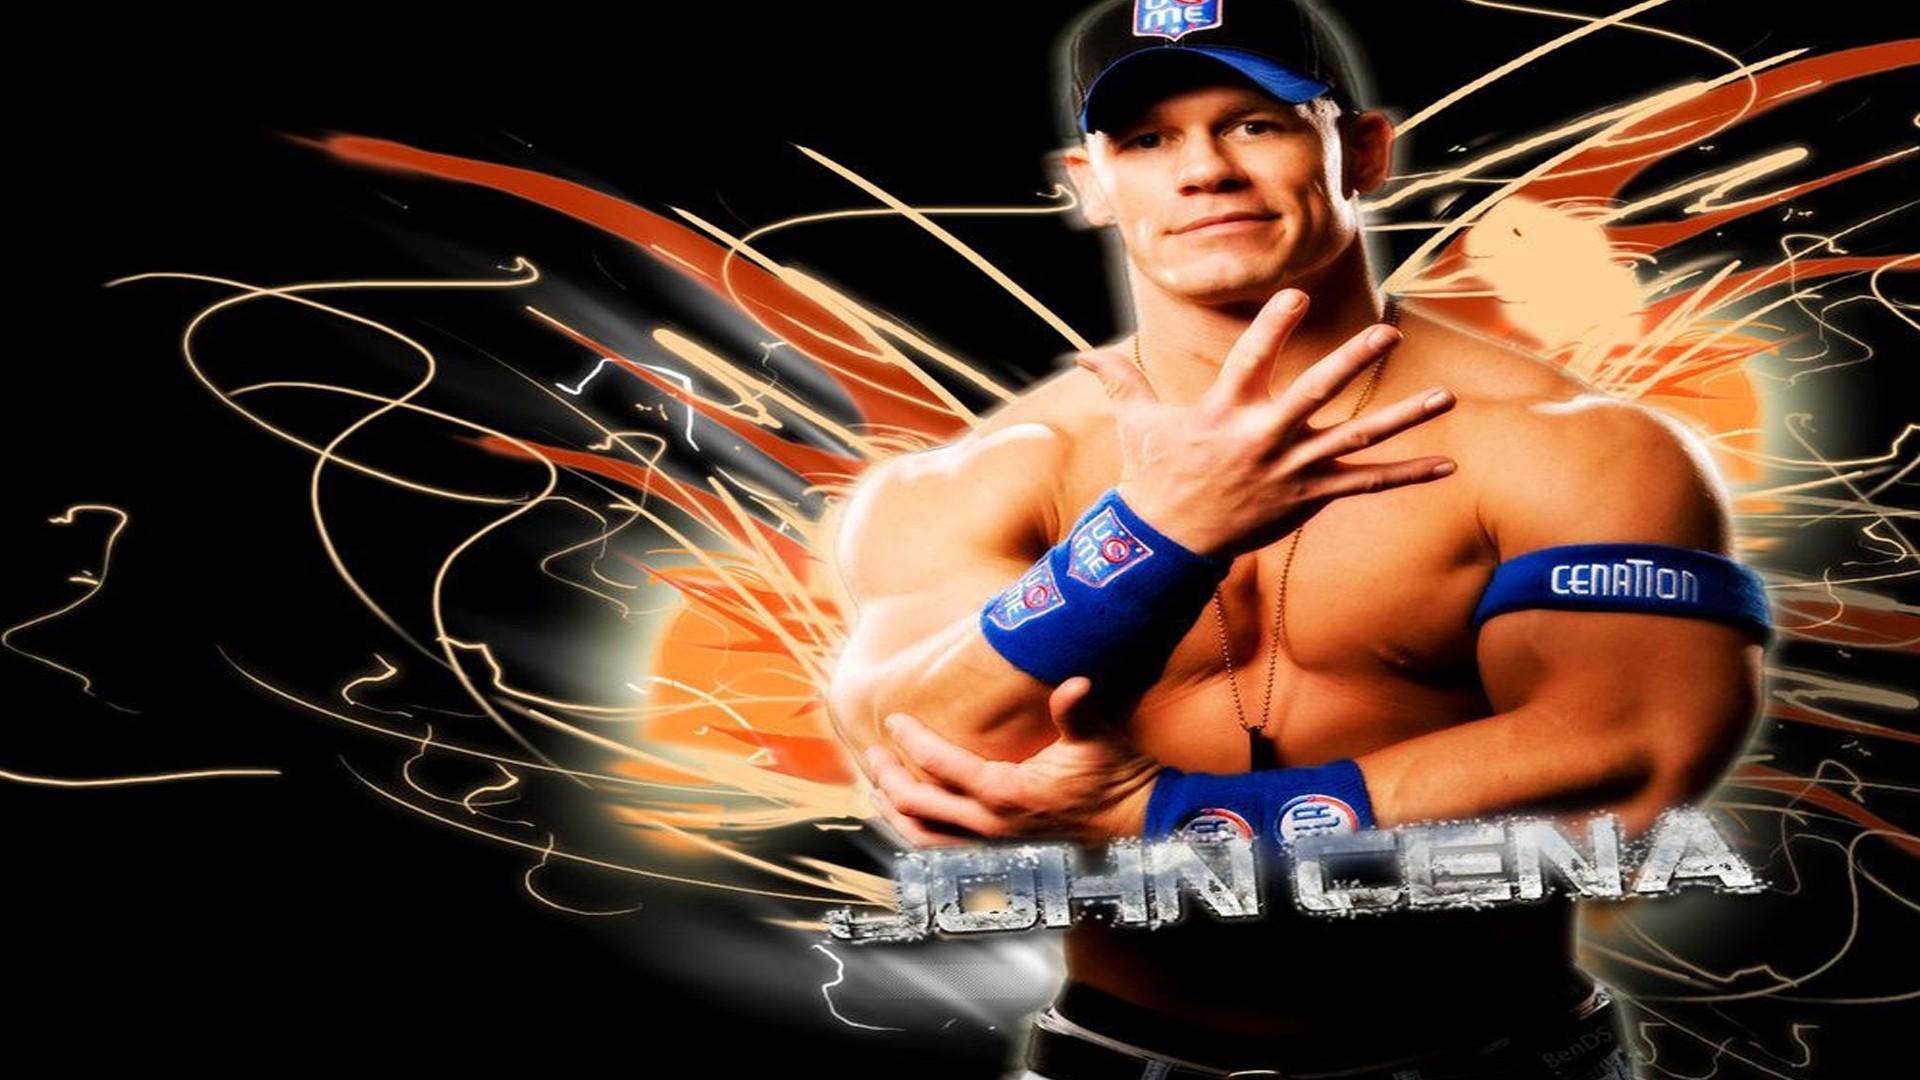 John Cena Body Wallpap...